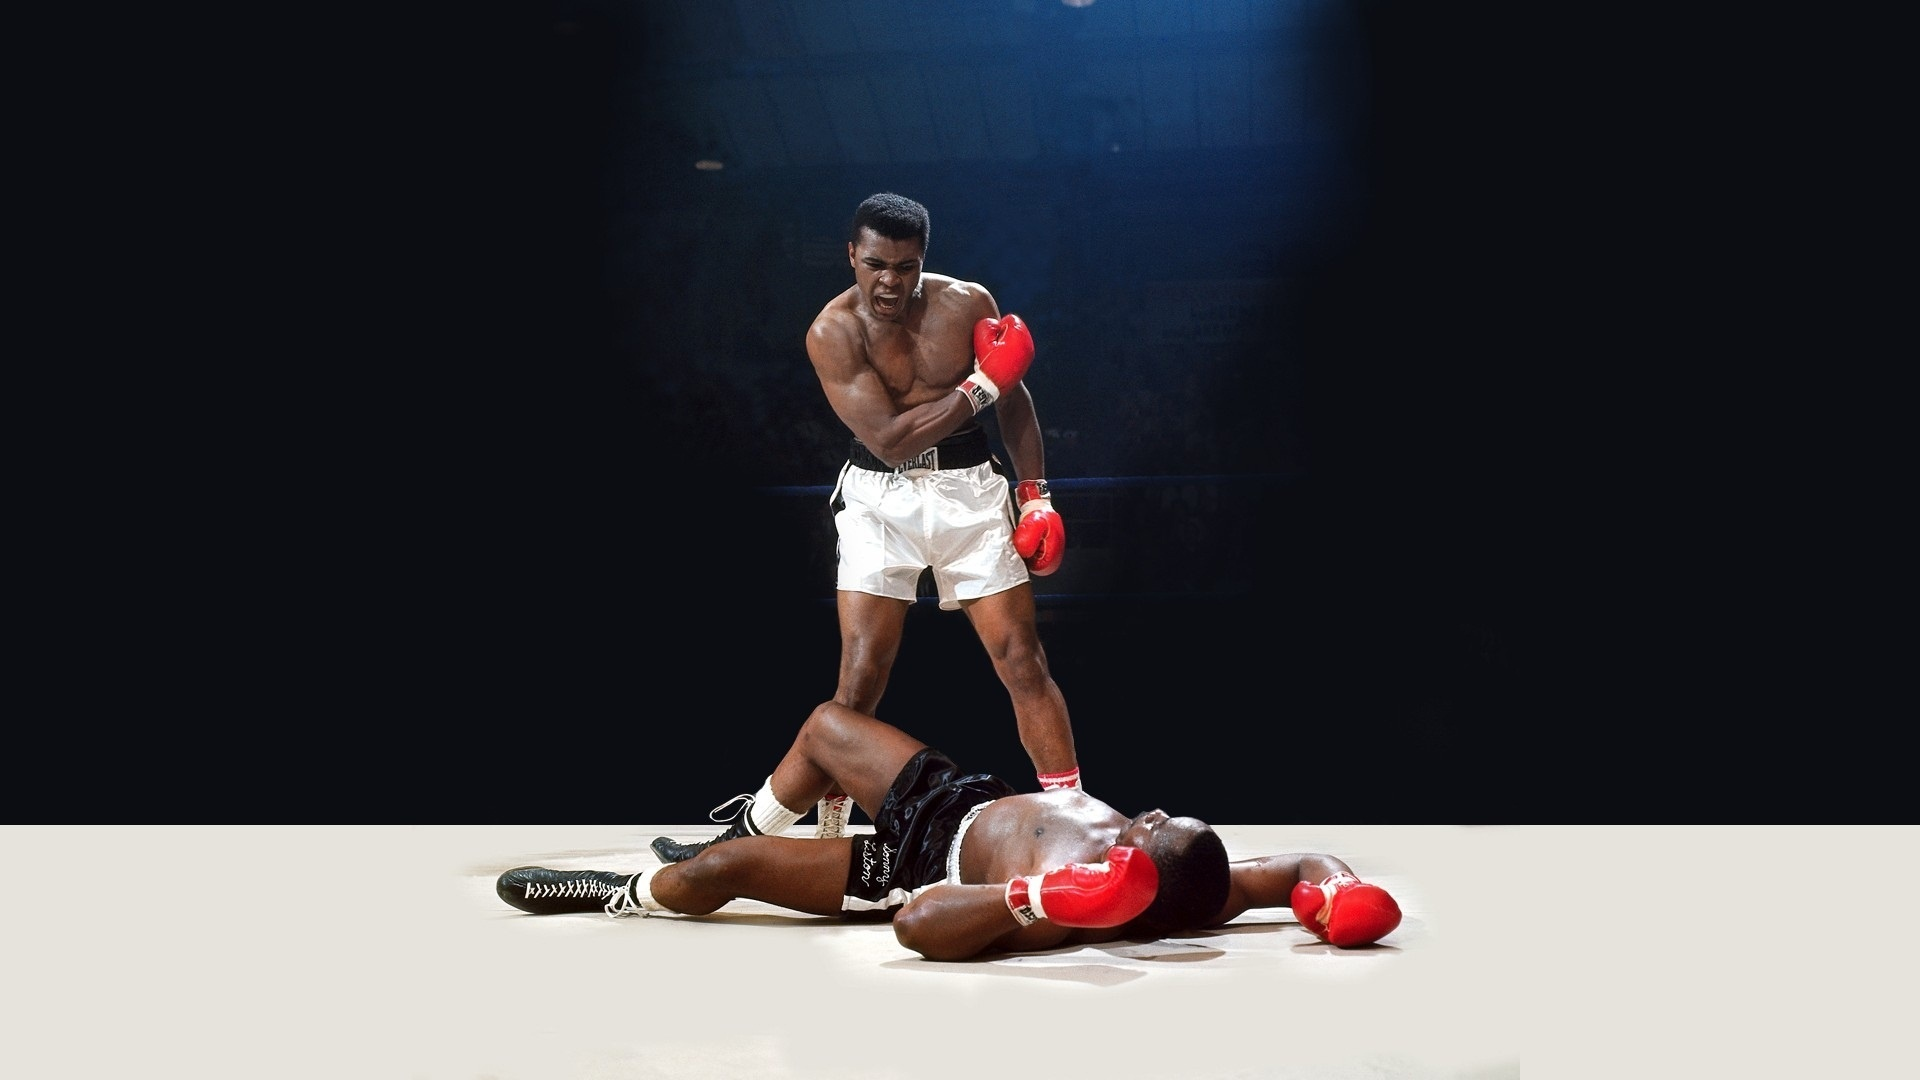 Muhammad Ali Boxer - Muhammad Ali Boxer - Wallpapers, 4k